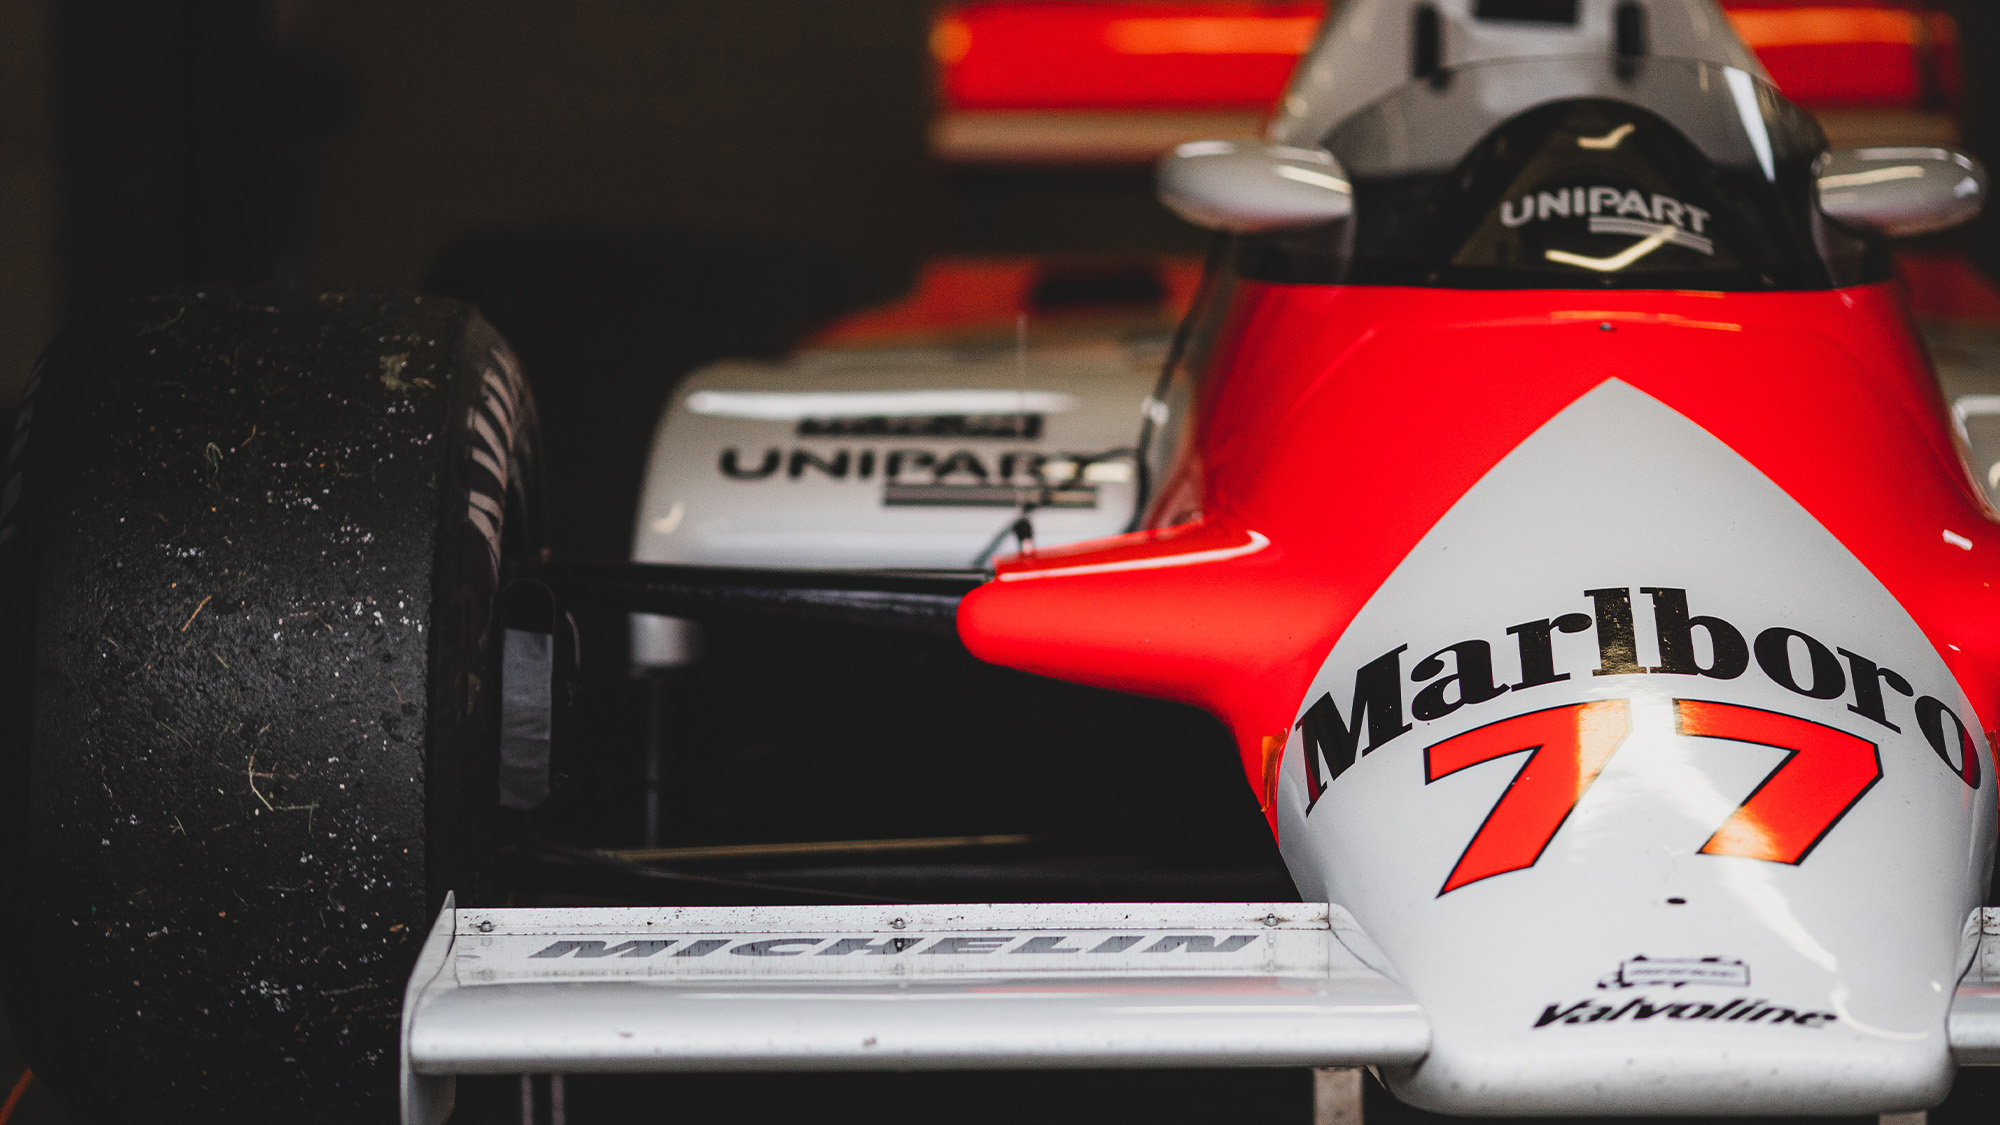 Steve Hartley McLaren MP4-1 at Brands Hatch 2021 - front view